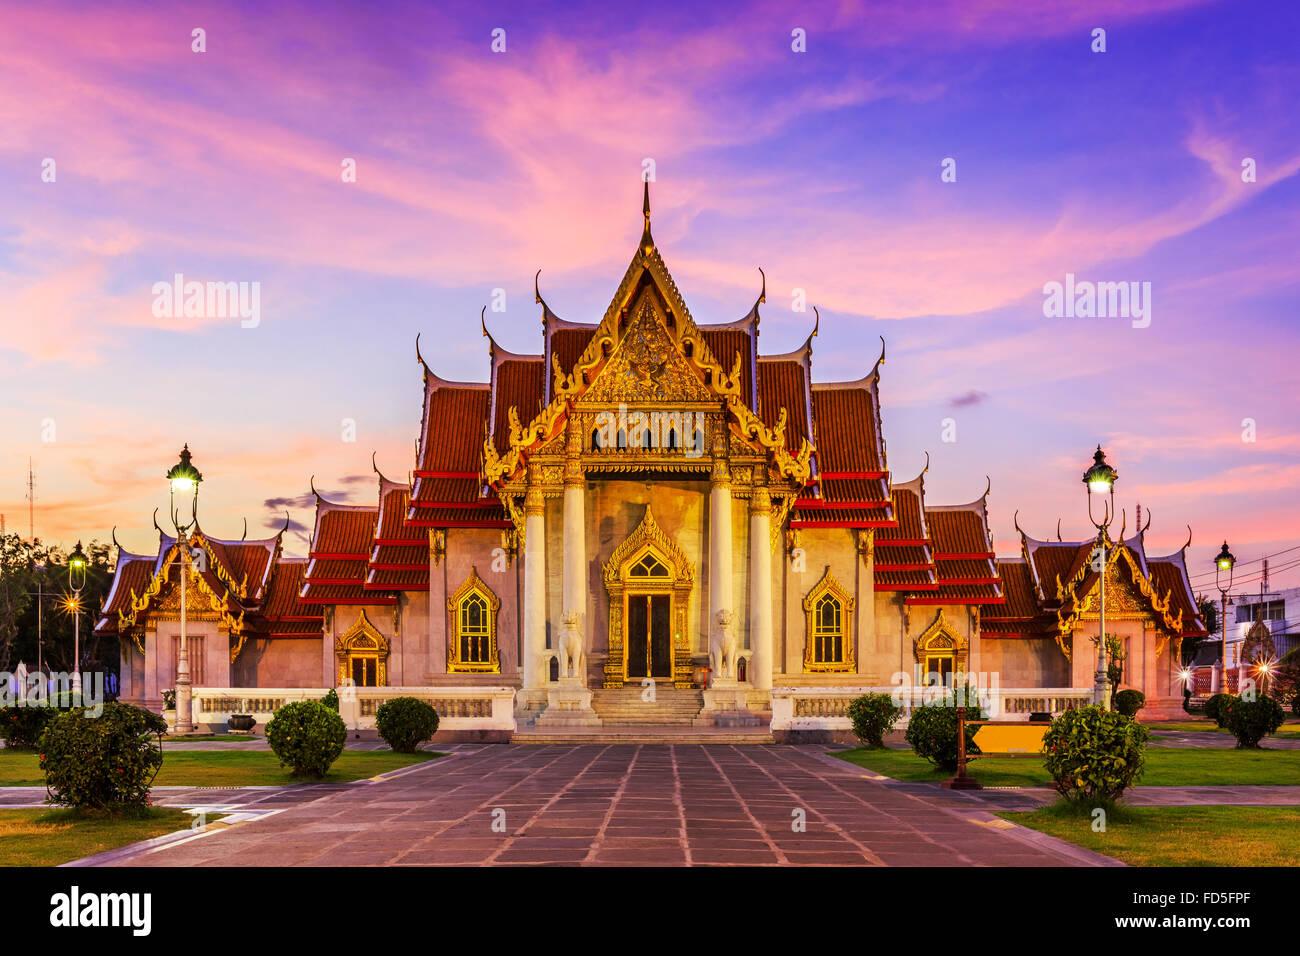 Bangkok, Tailandia. Il tempio in marmo, Wat Benchamabopit Dusitvanaram al tramonto. Foto Stock